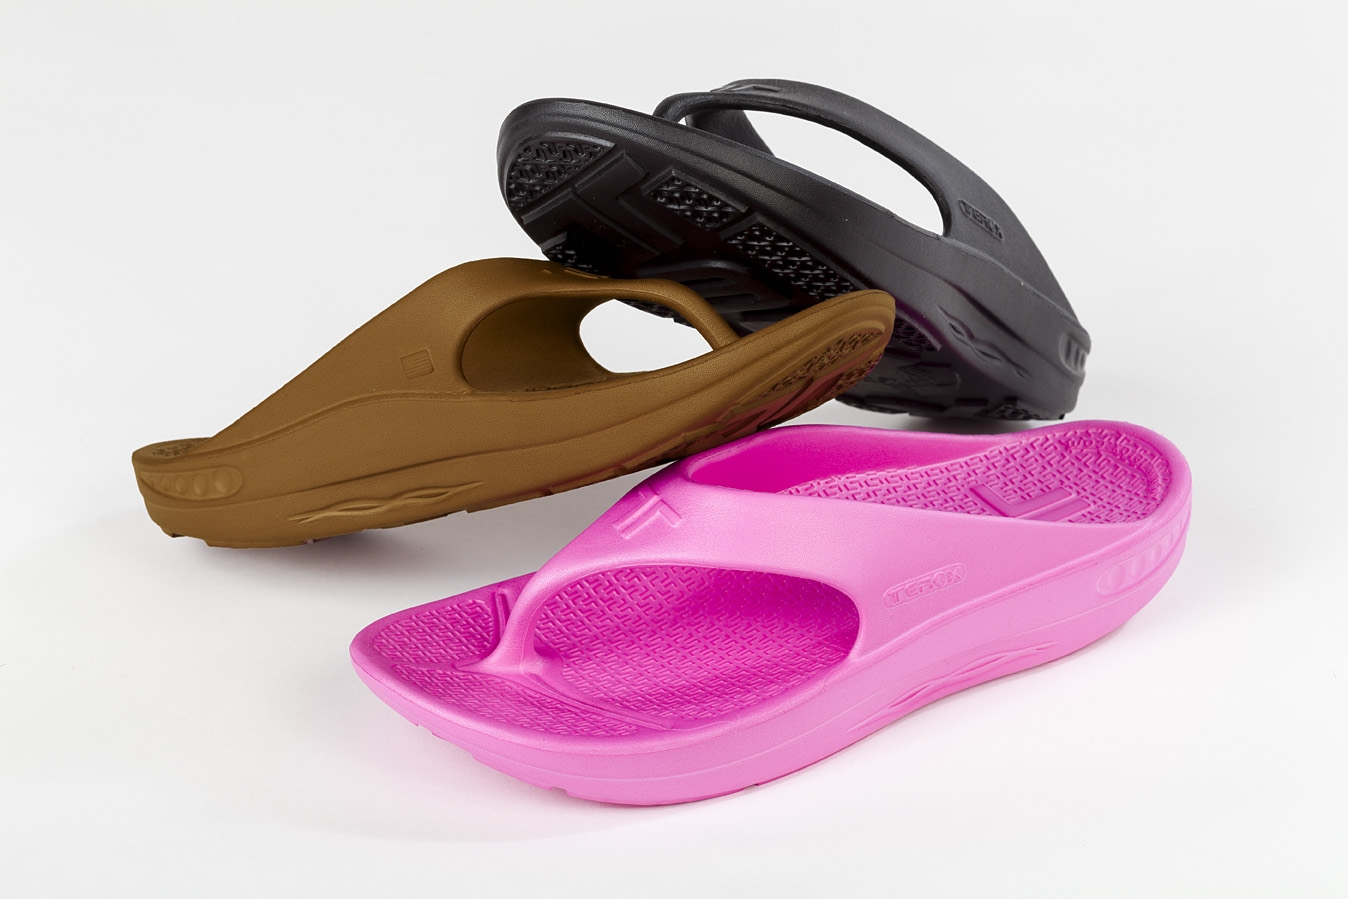 ab14d9b7093 The Comfort Shoe Report  Terox Footwear Review -